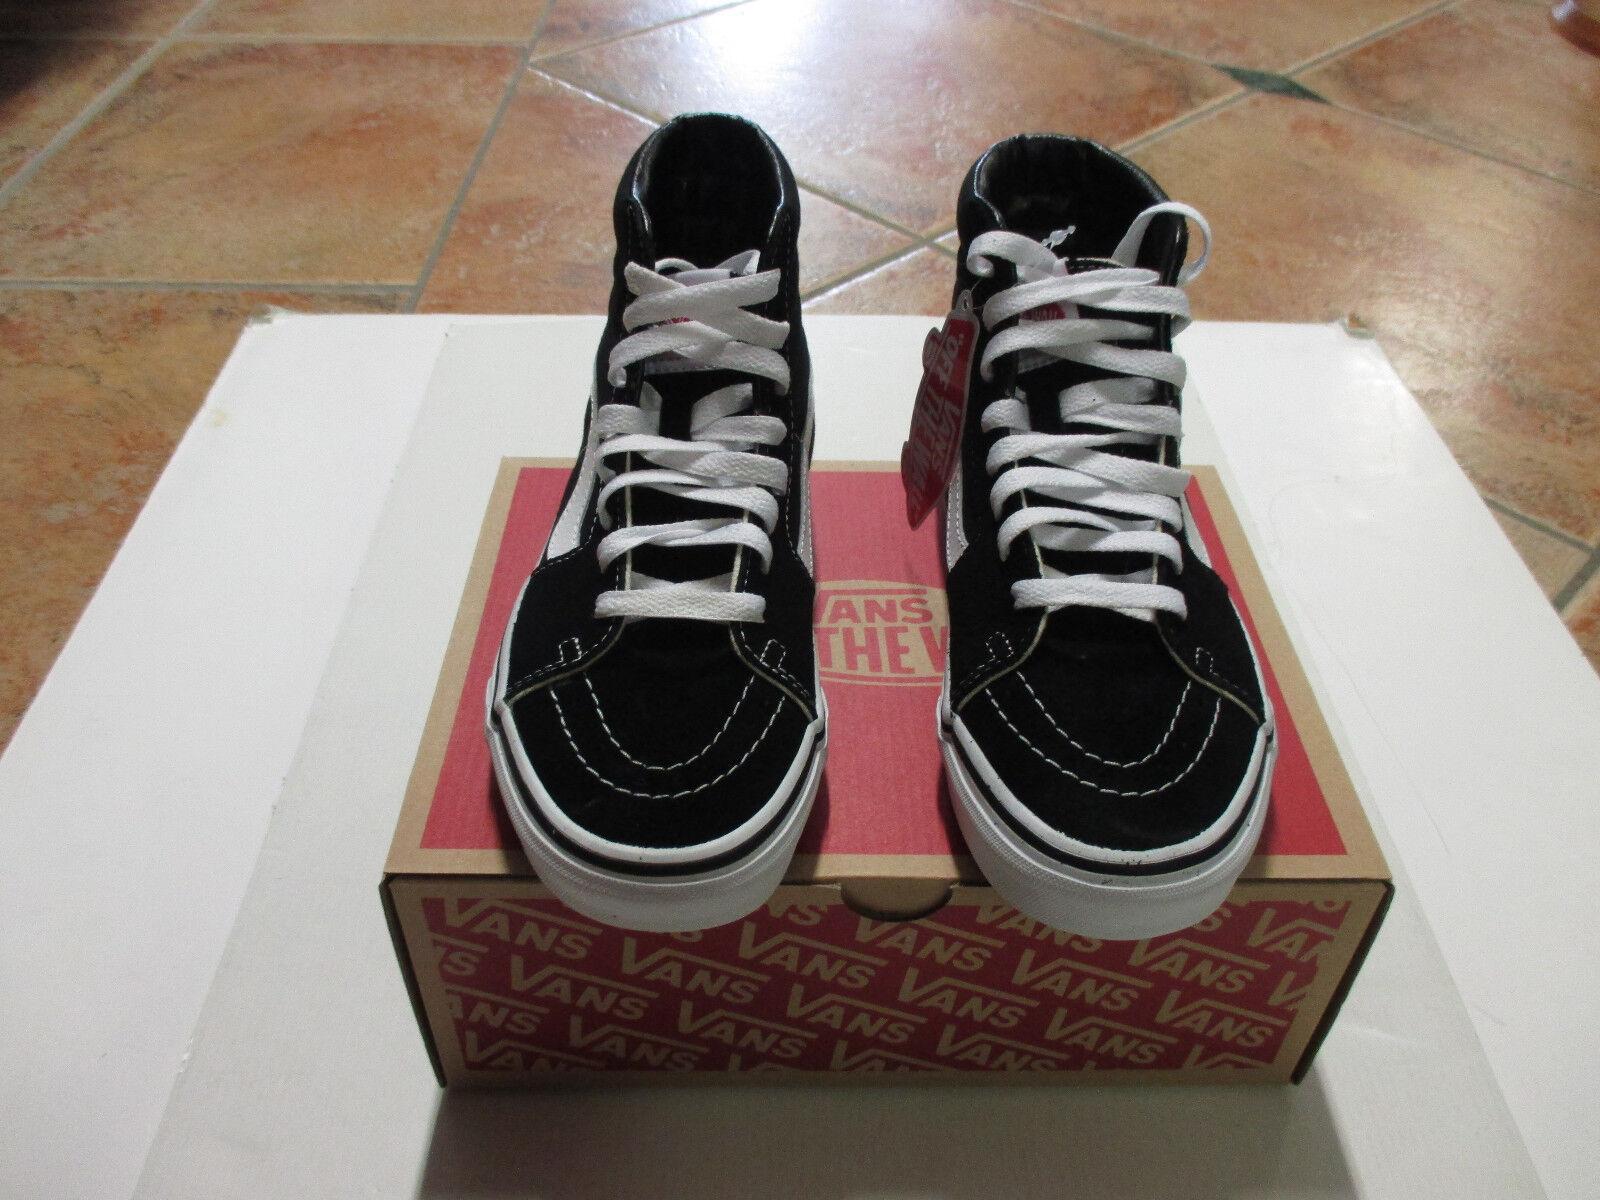 VANS SK8-HI   Farbe:  Black/Black/White  Größe: 40,5  SK8-HI Model: VD5IB8C NEU 699fef